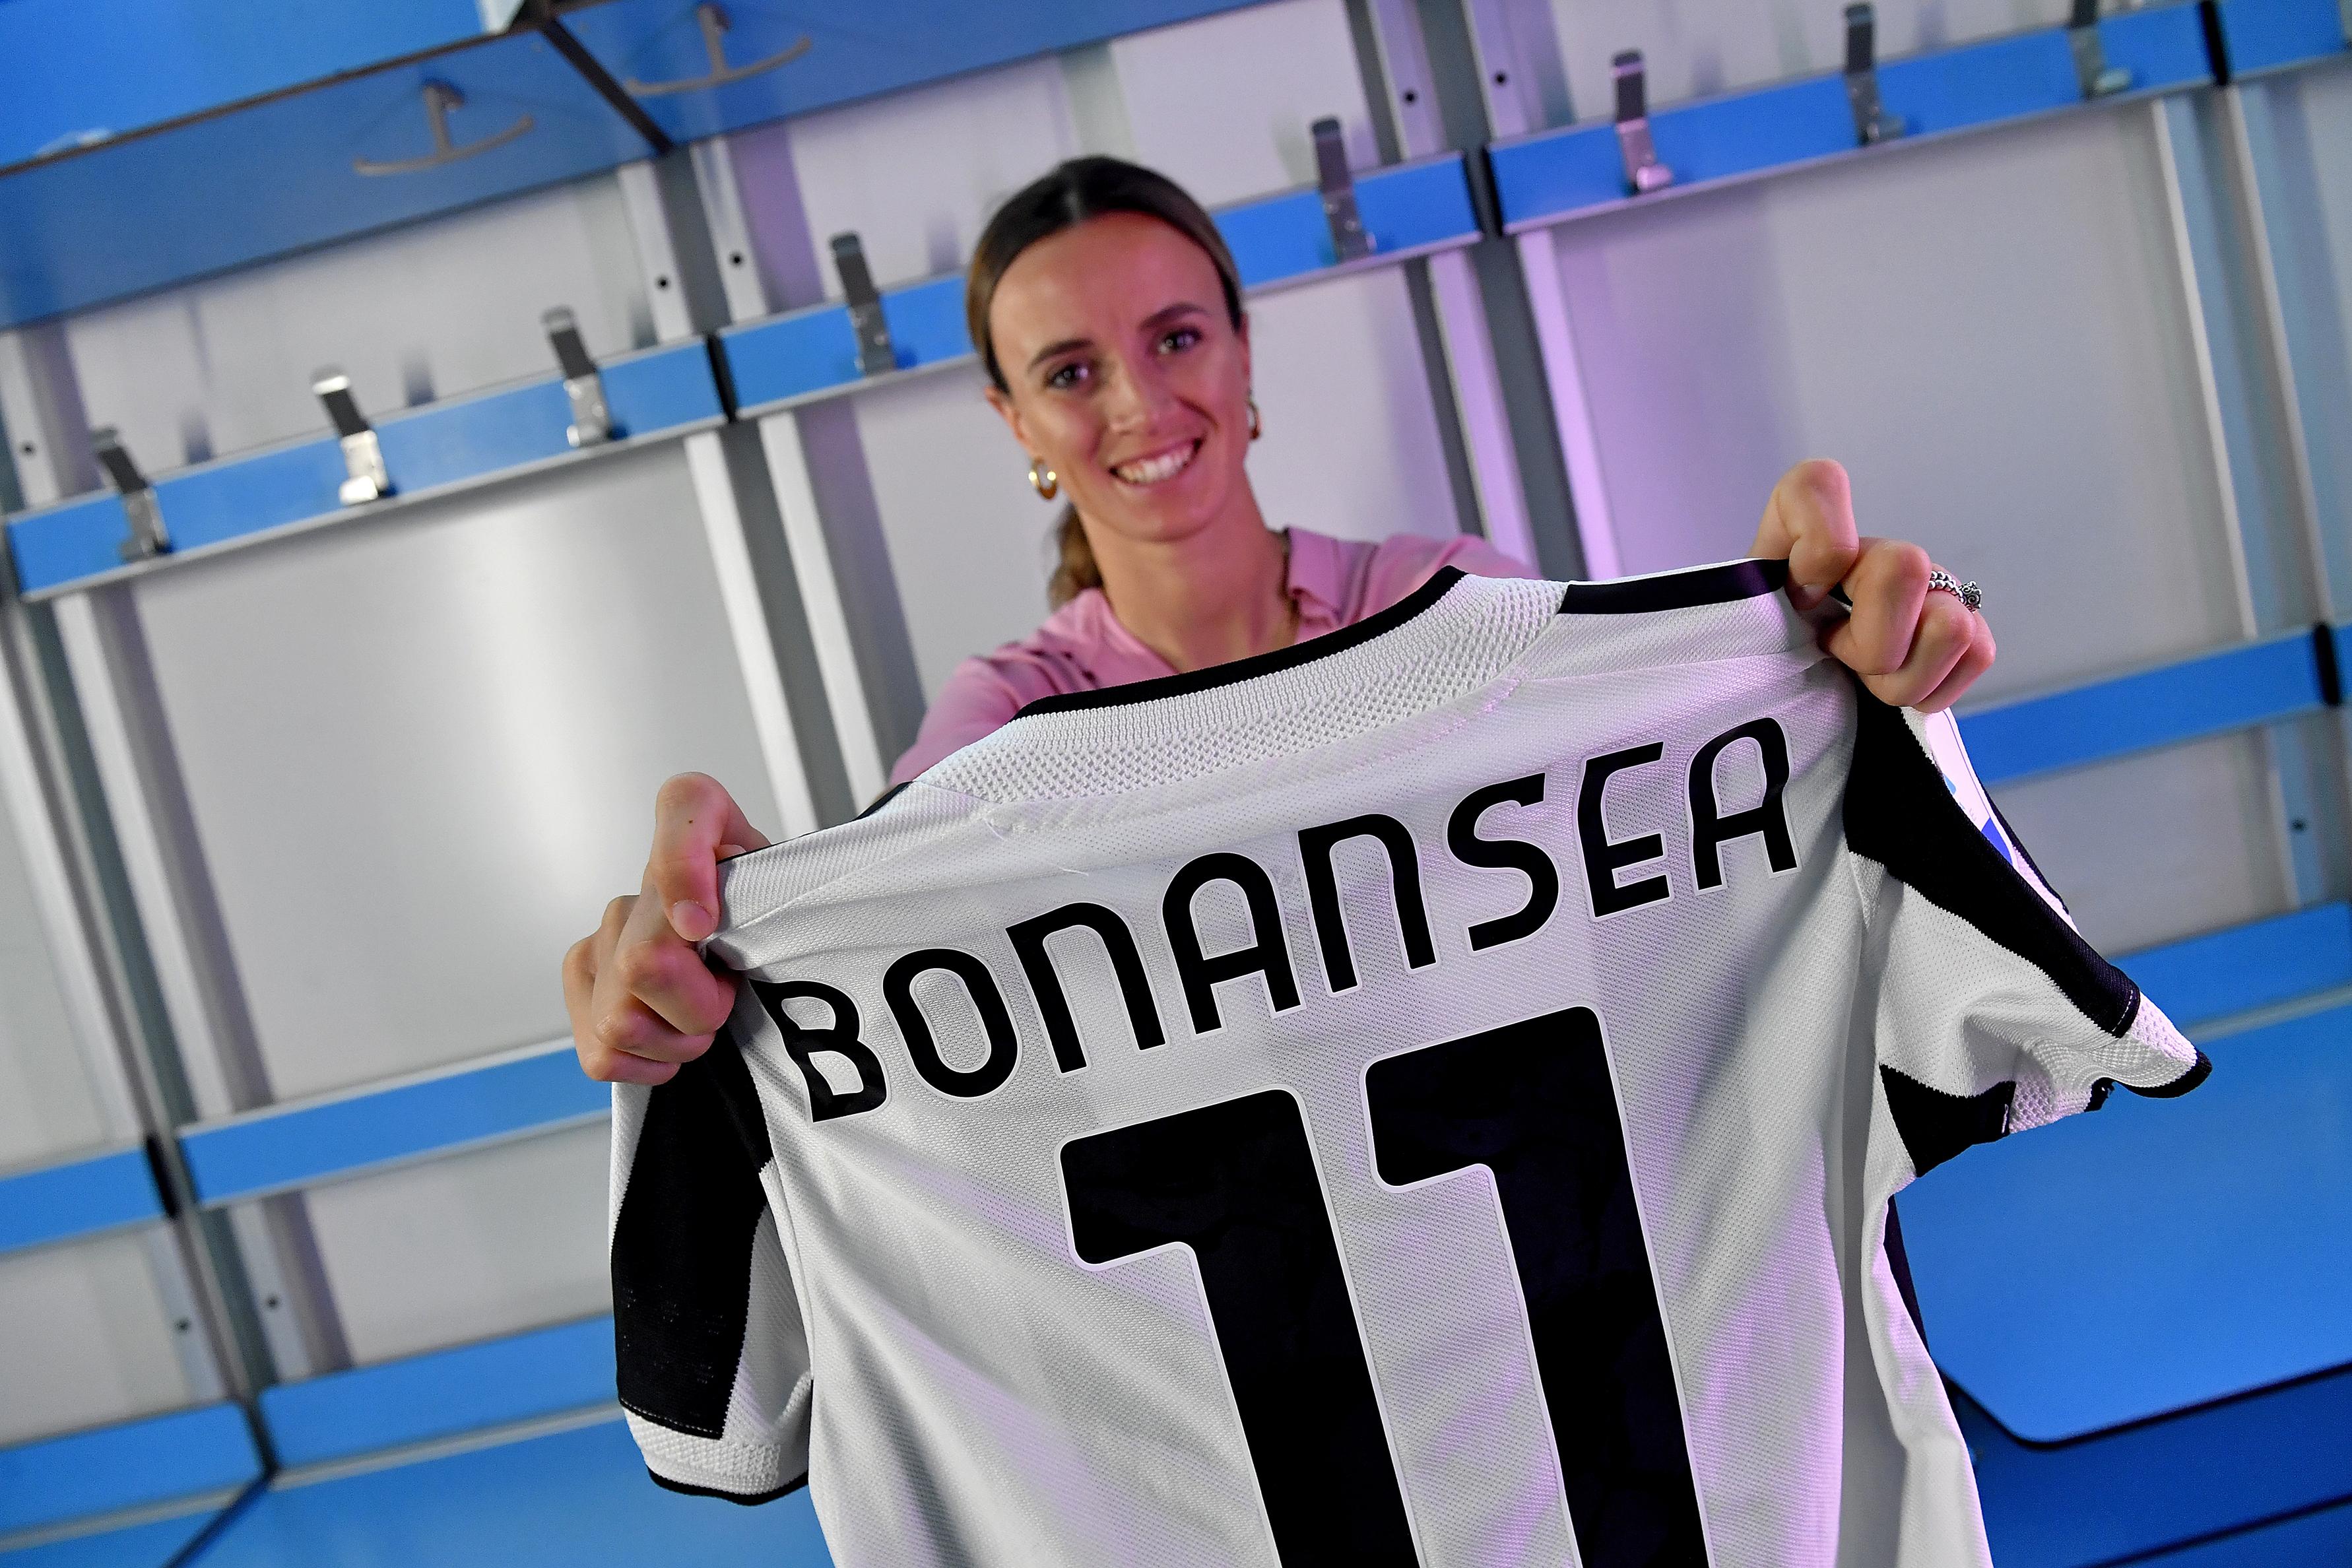 Barbara Bonansea Extends Her Contract With Juventus Women